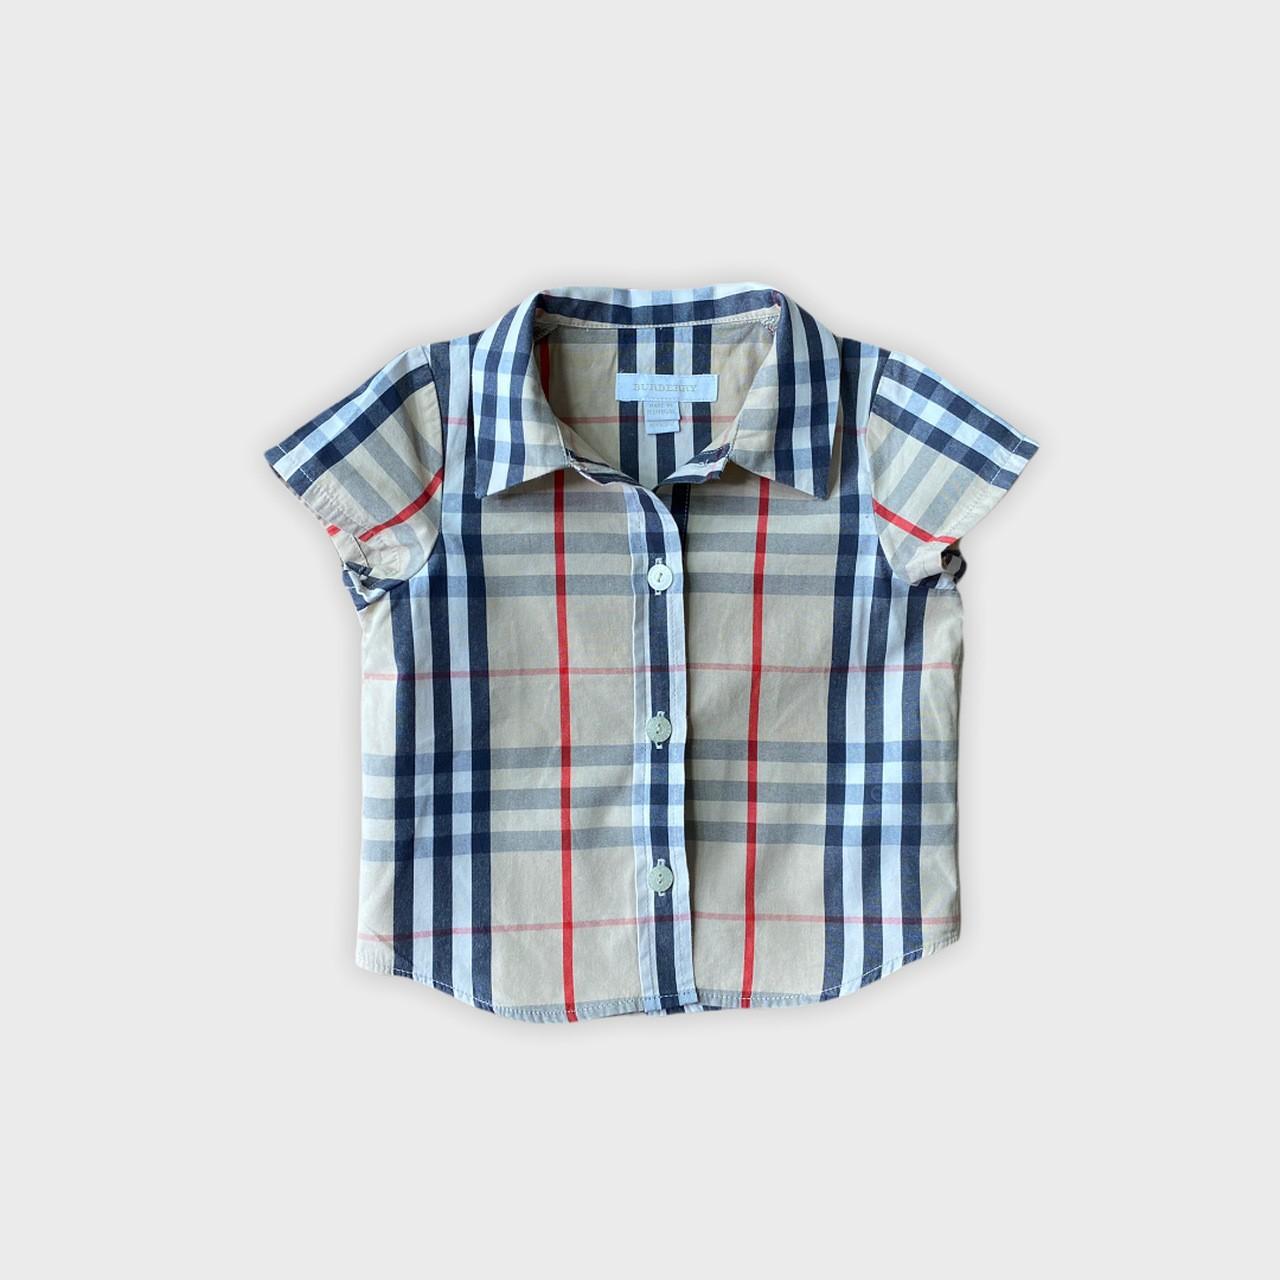 Camisa Burberry 6 meses